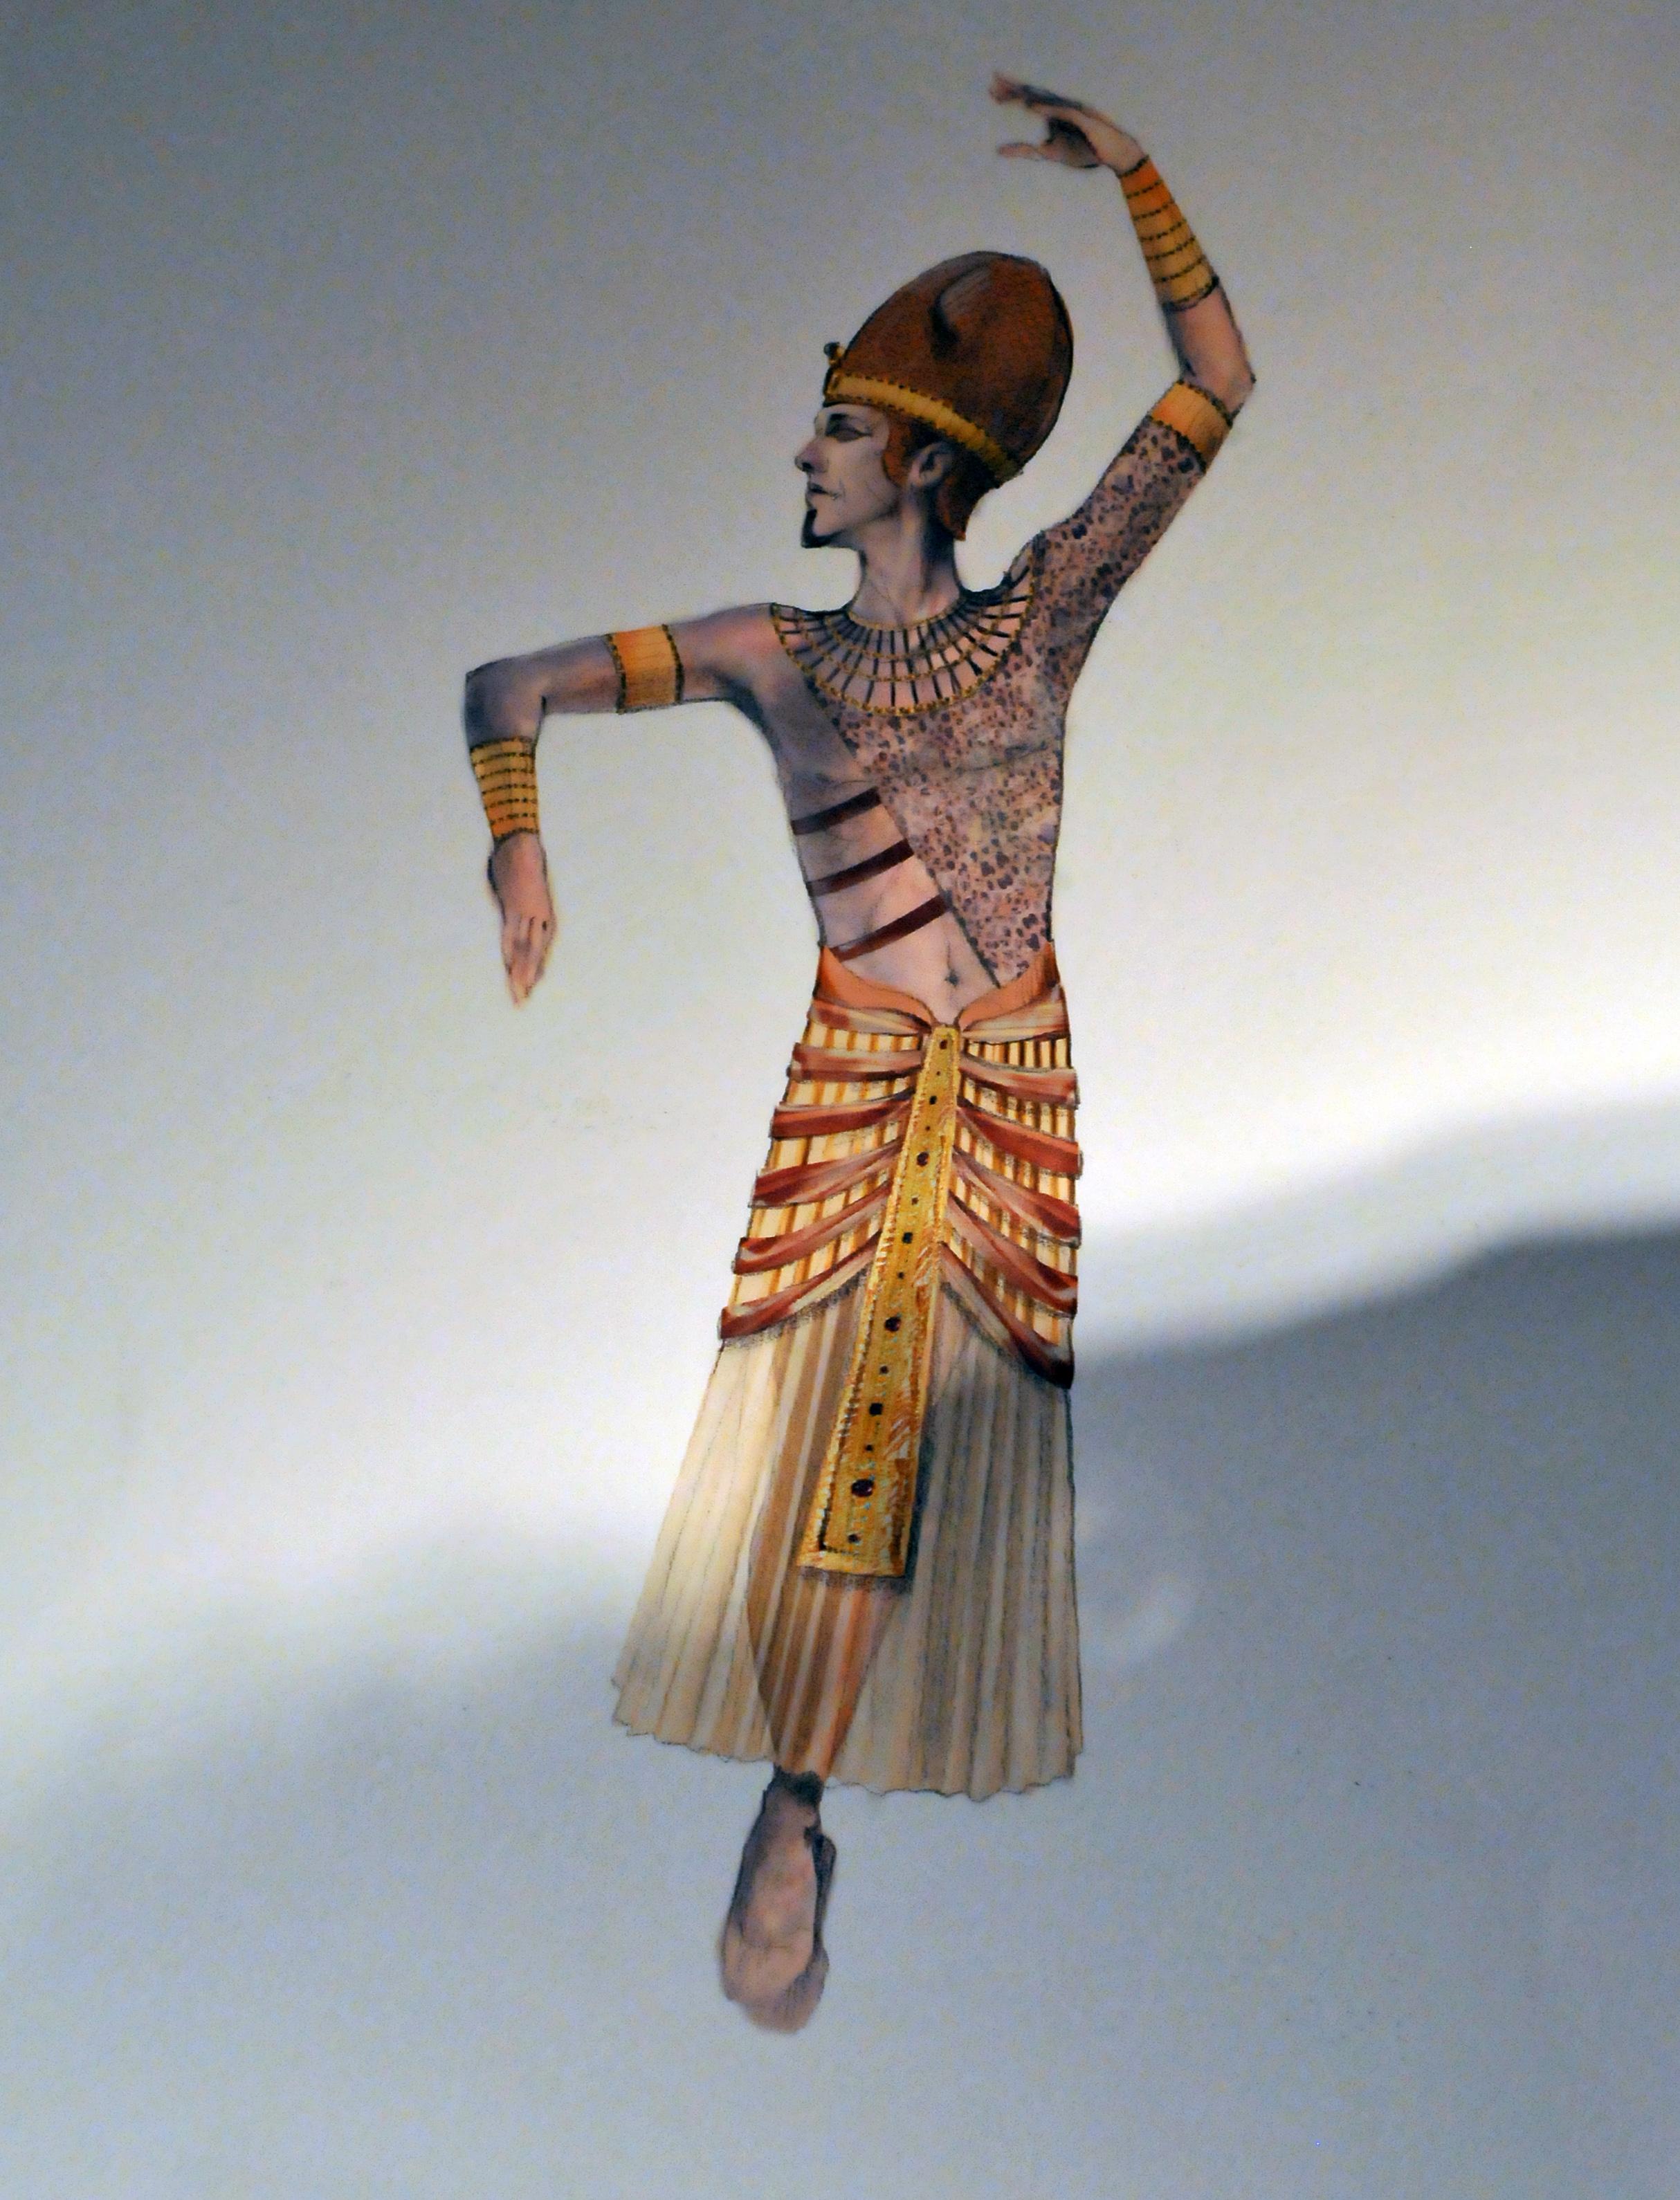 ballet, Northern Ballet, Cleopatra, costumes